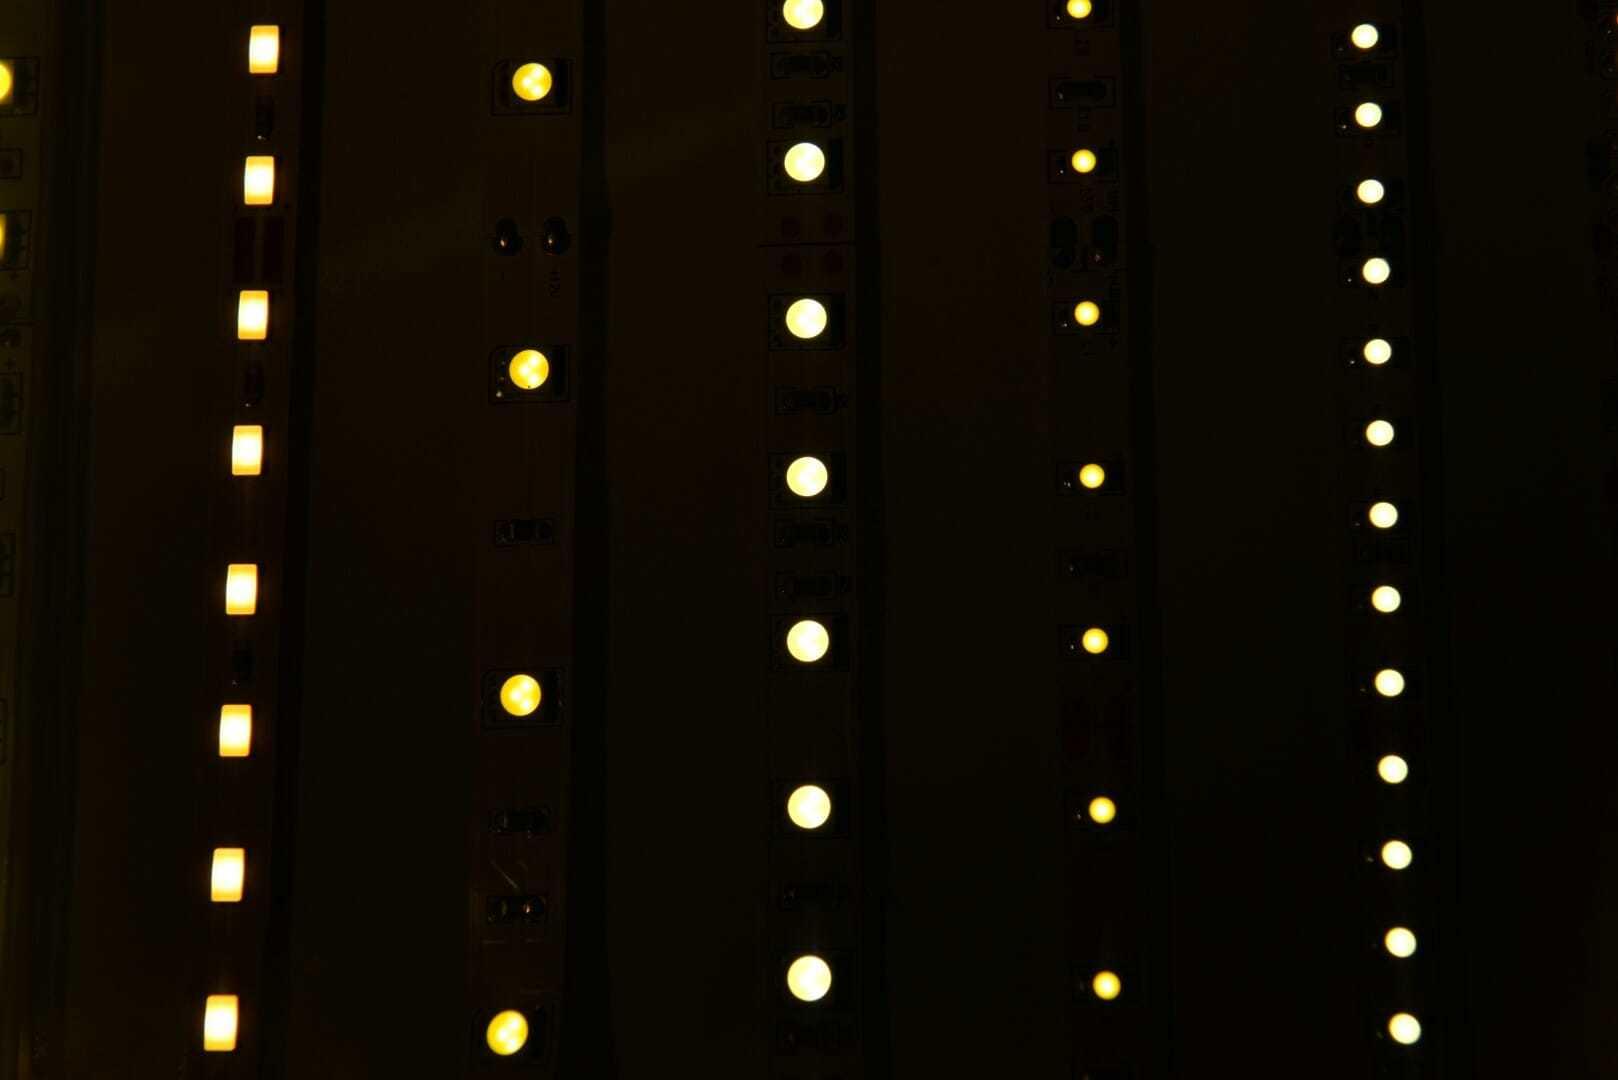 Strisce led, nuove spazi da illuminareTUTTOLUCE